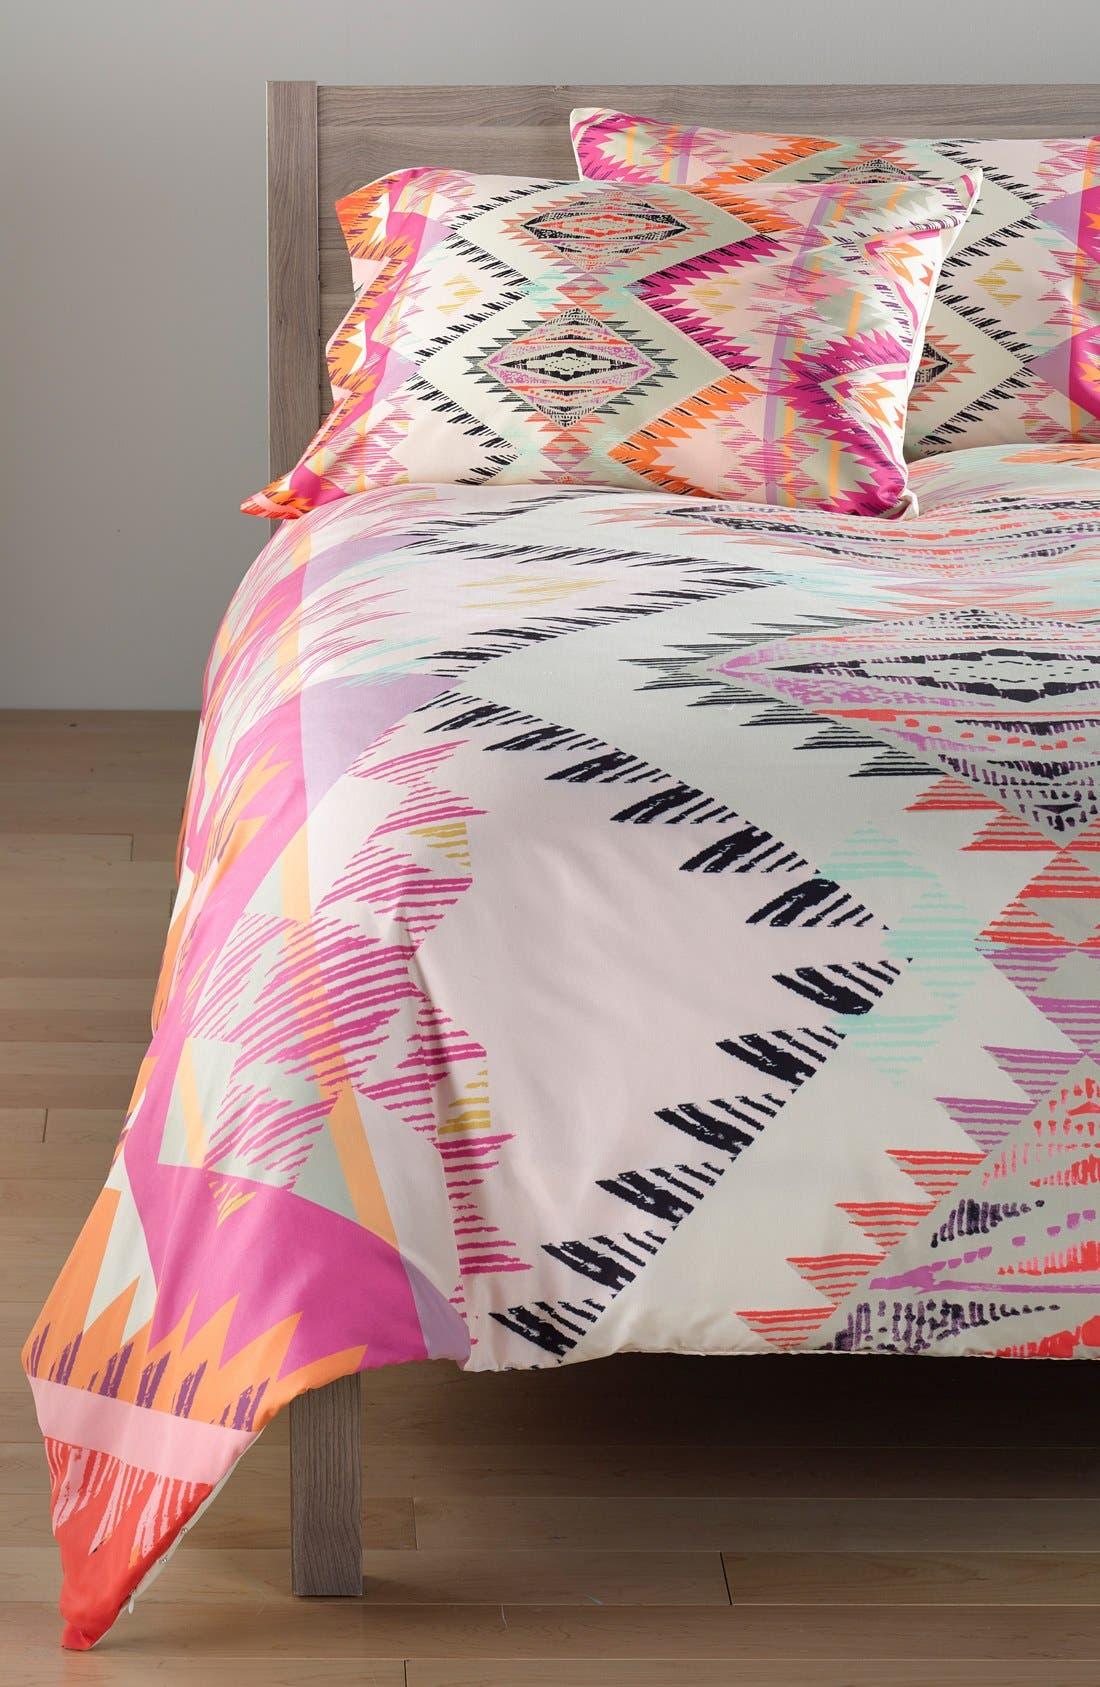 Main Image - DENY Designs Pattern State Marker Sun Duvet Cover & Sham Set